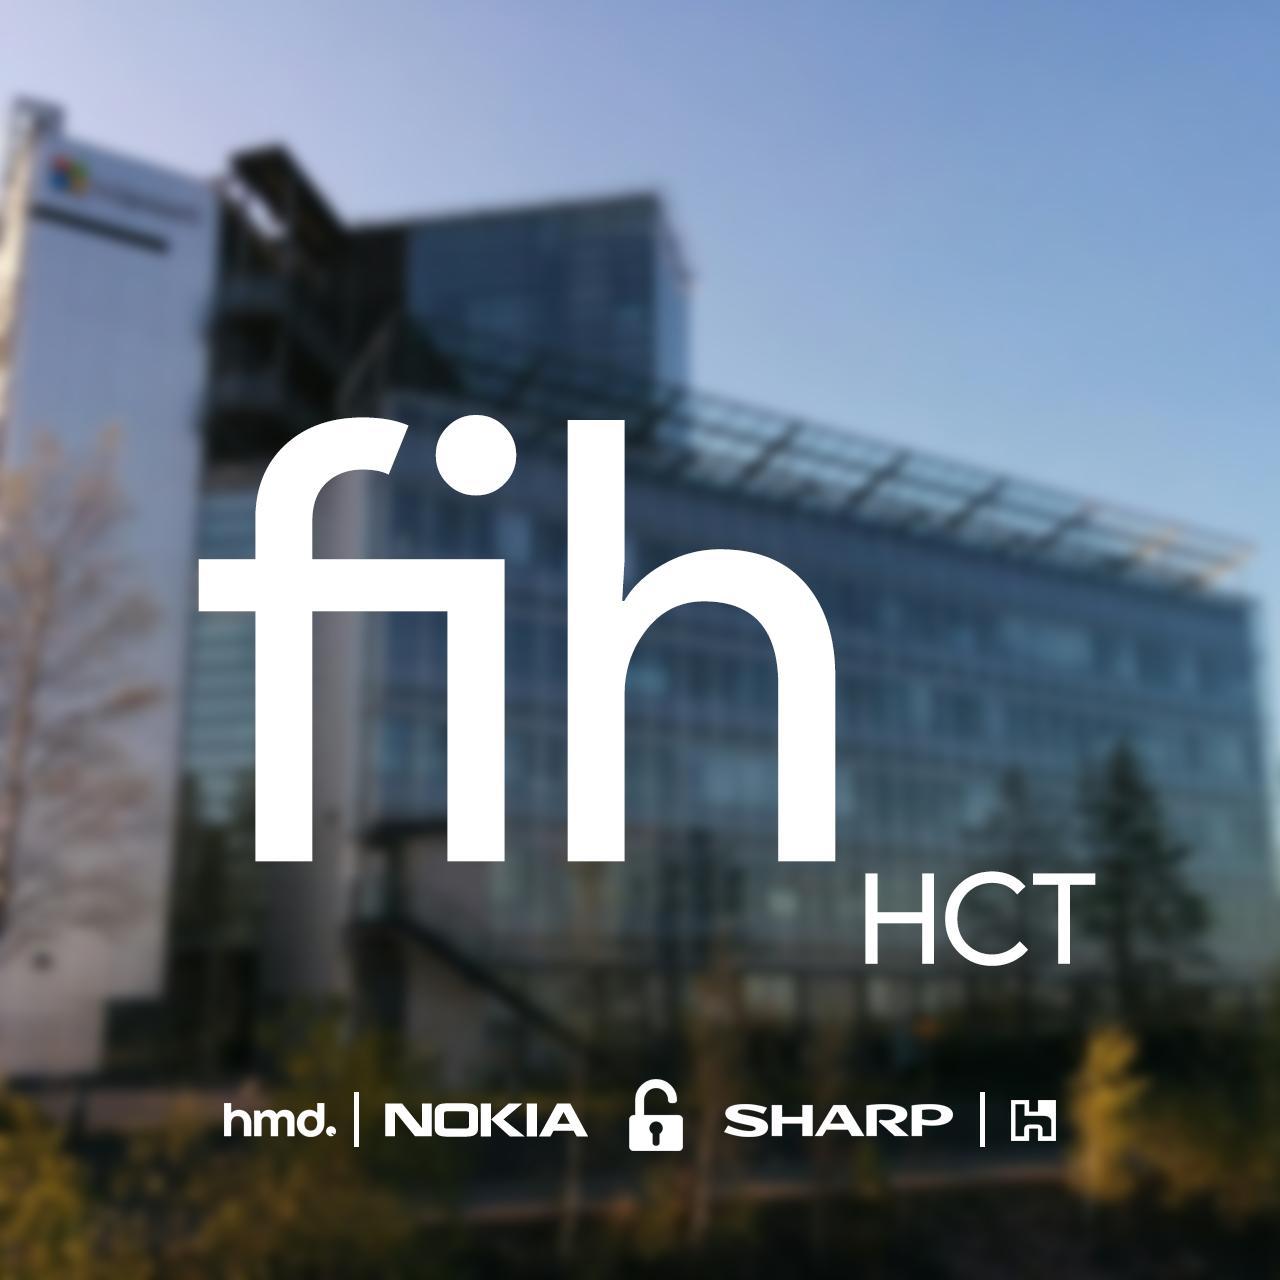 FIH安卓的固件版本号特征和识别方式